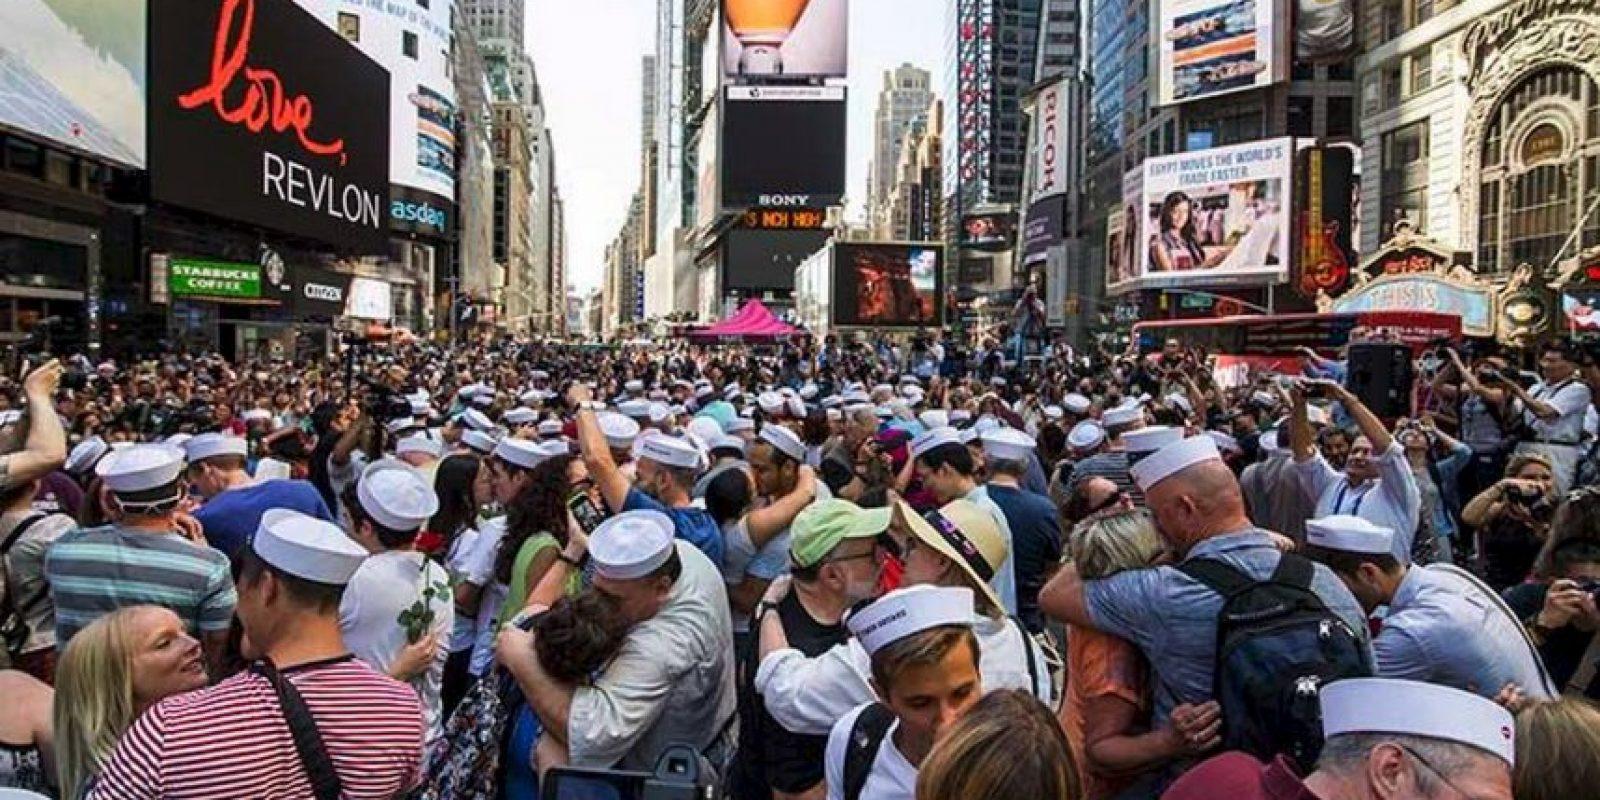 Así se vivió el momento del beso masivo Foto:twitter.com/XHNews